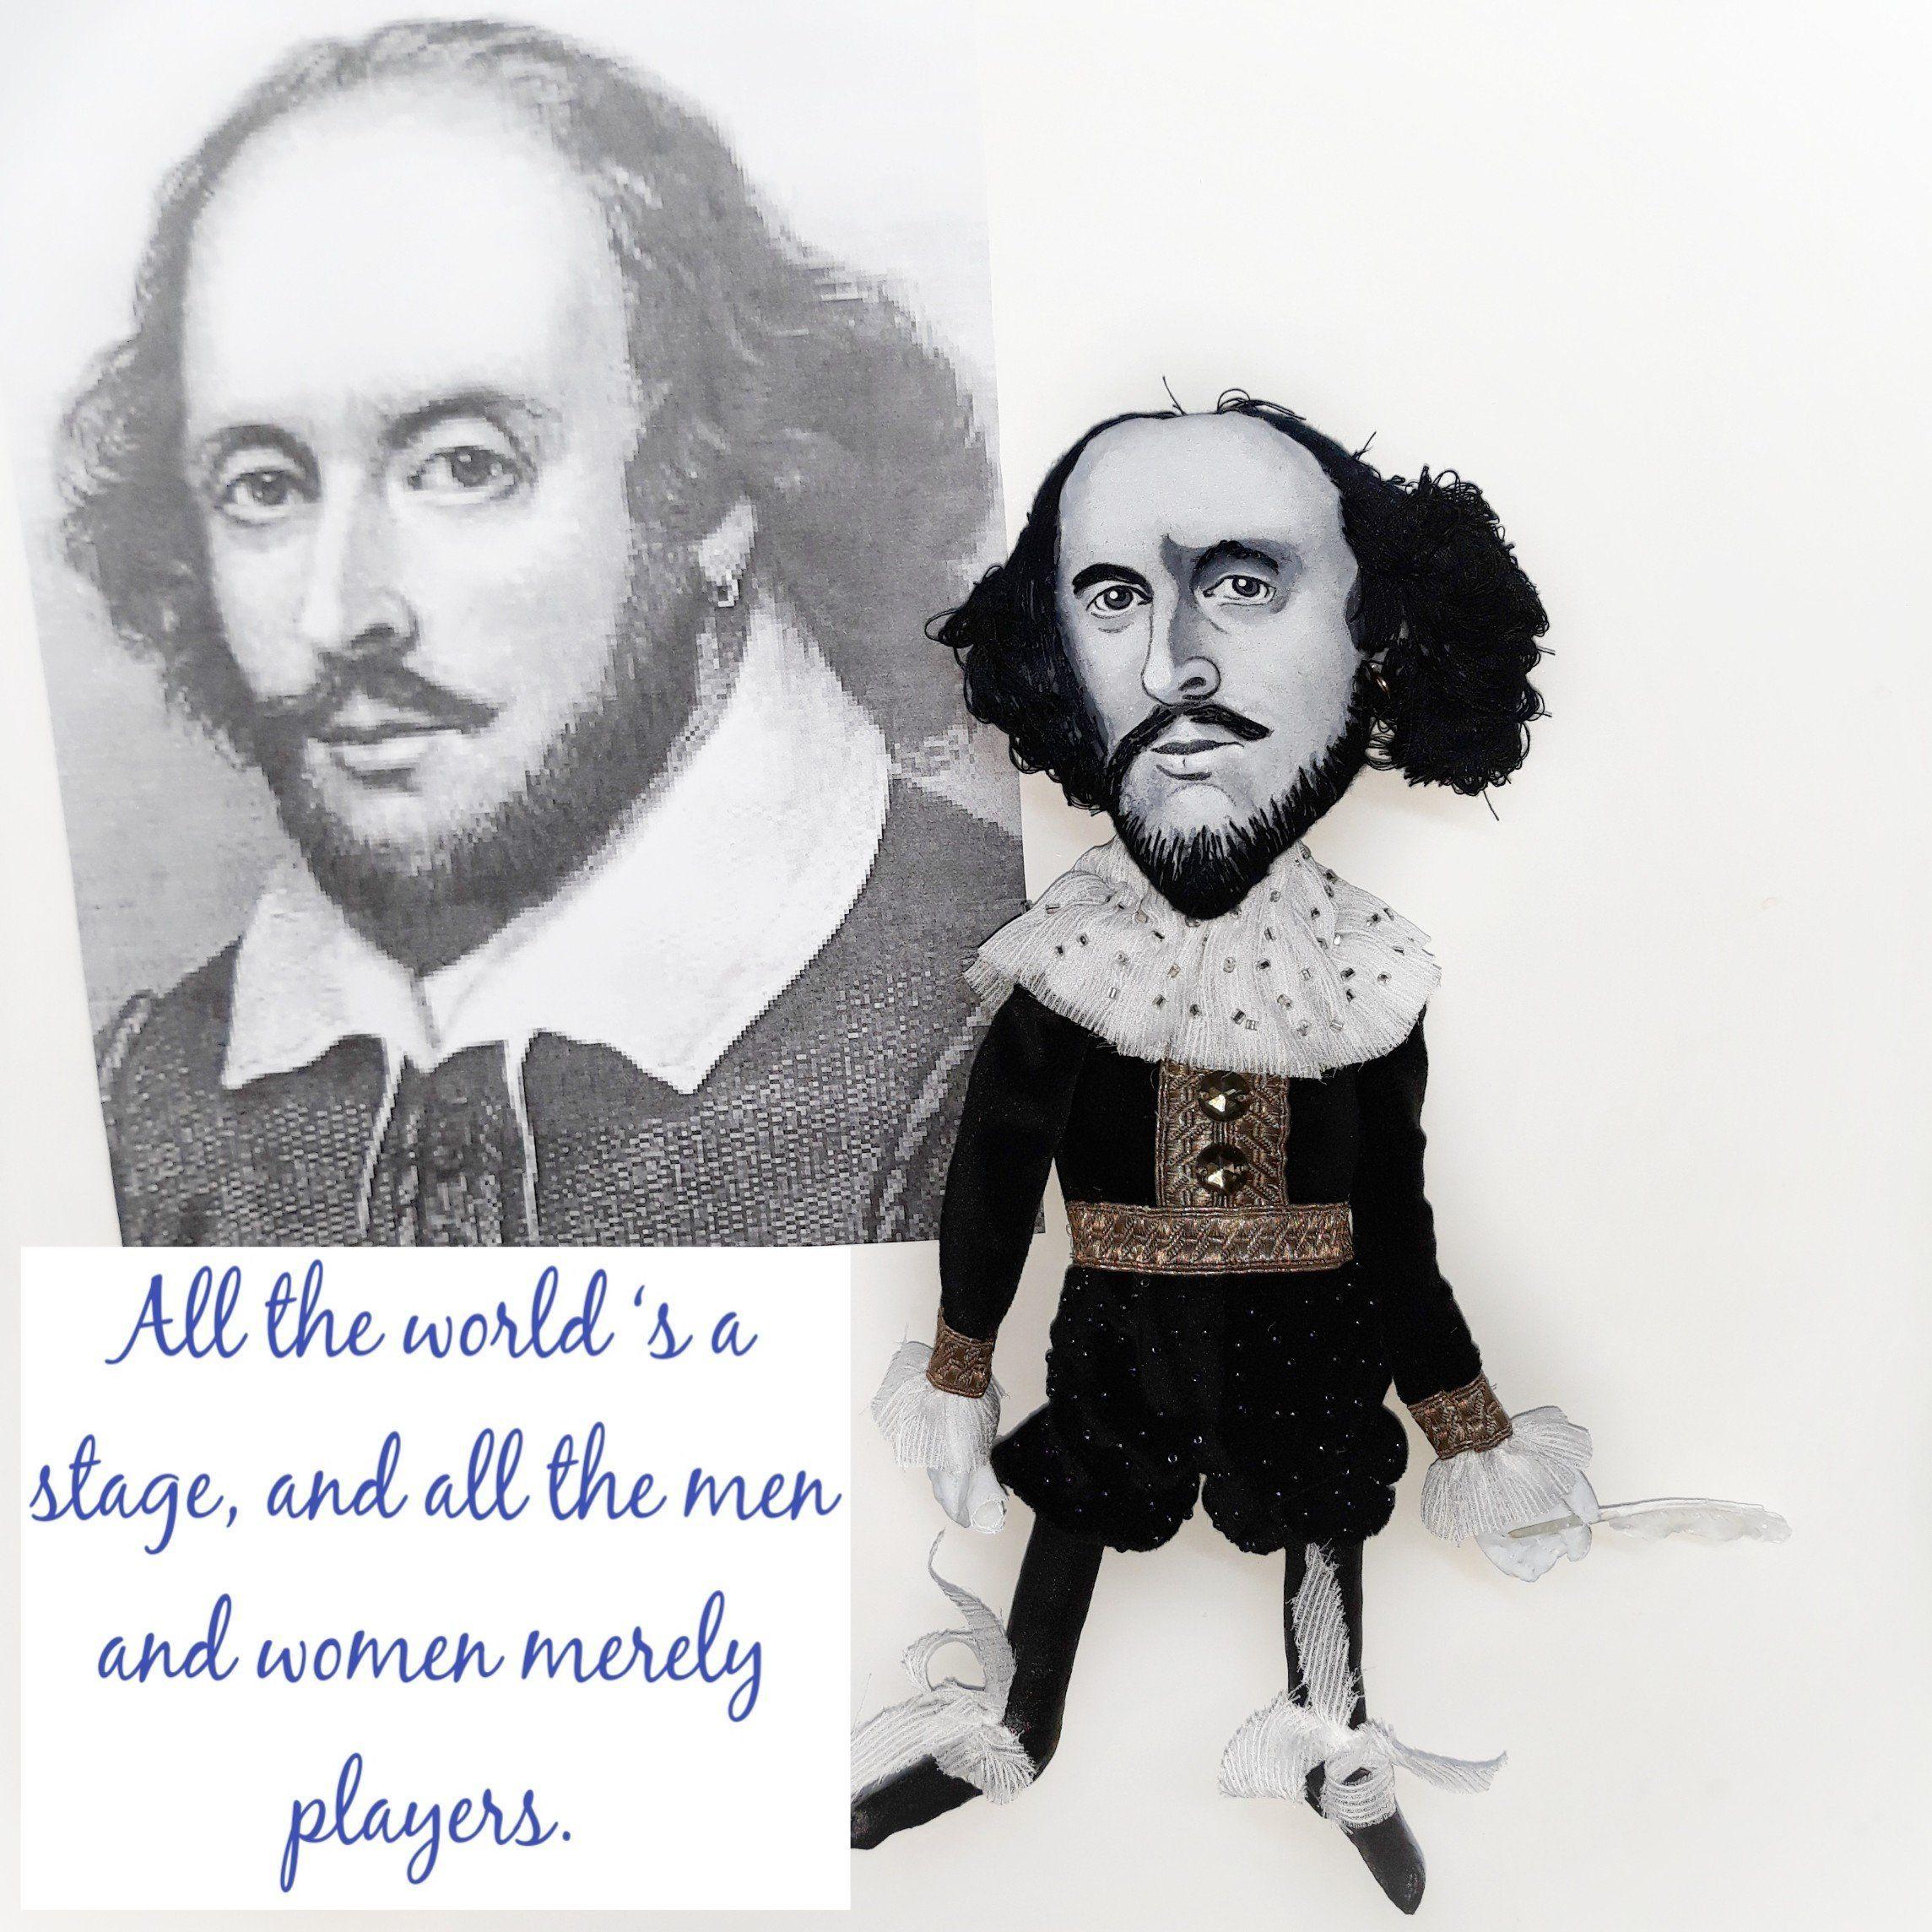 William Shakespeare Doll English Playwright Author